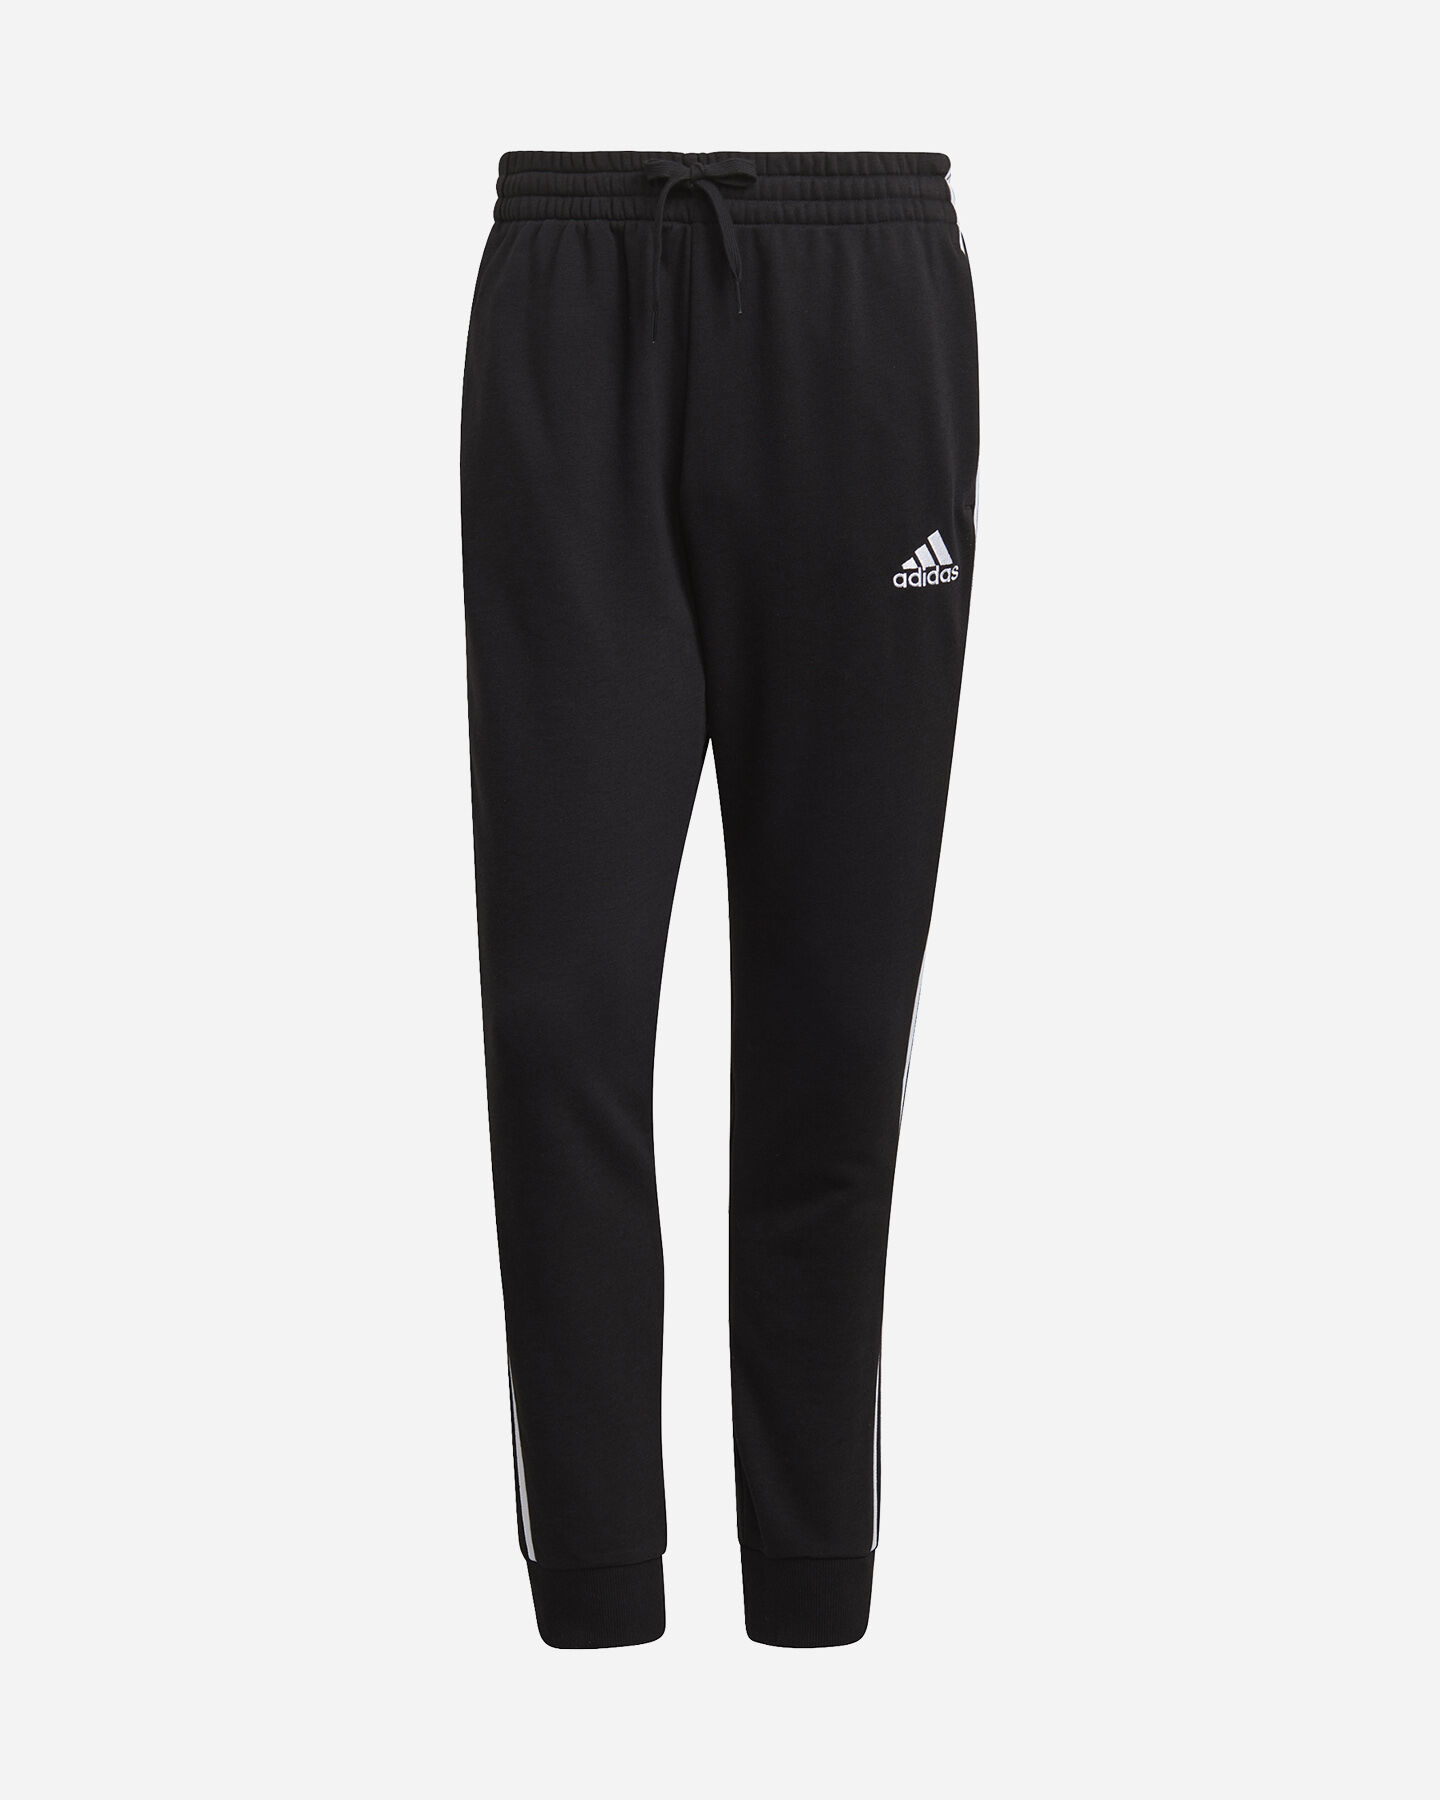 Pantalone ADIDAS FRT CORE 3S M S5274264 scatto 0